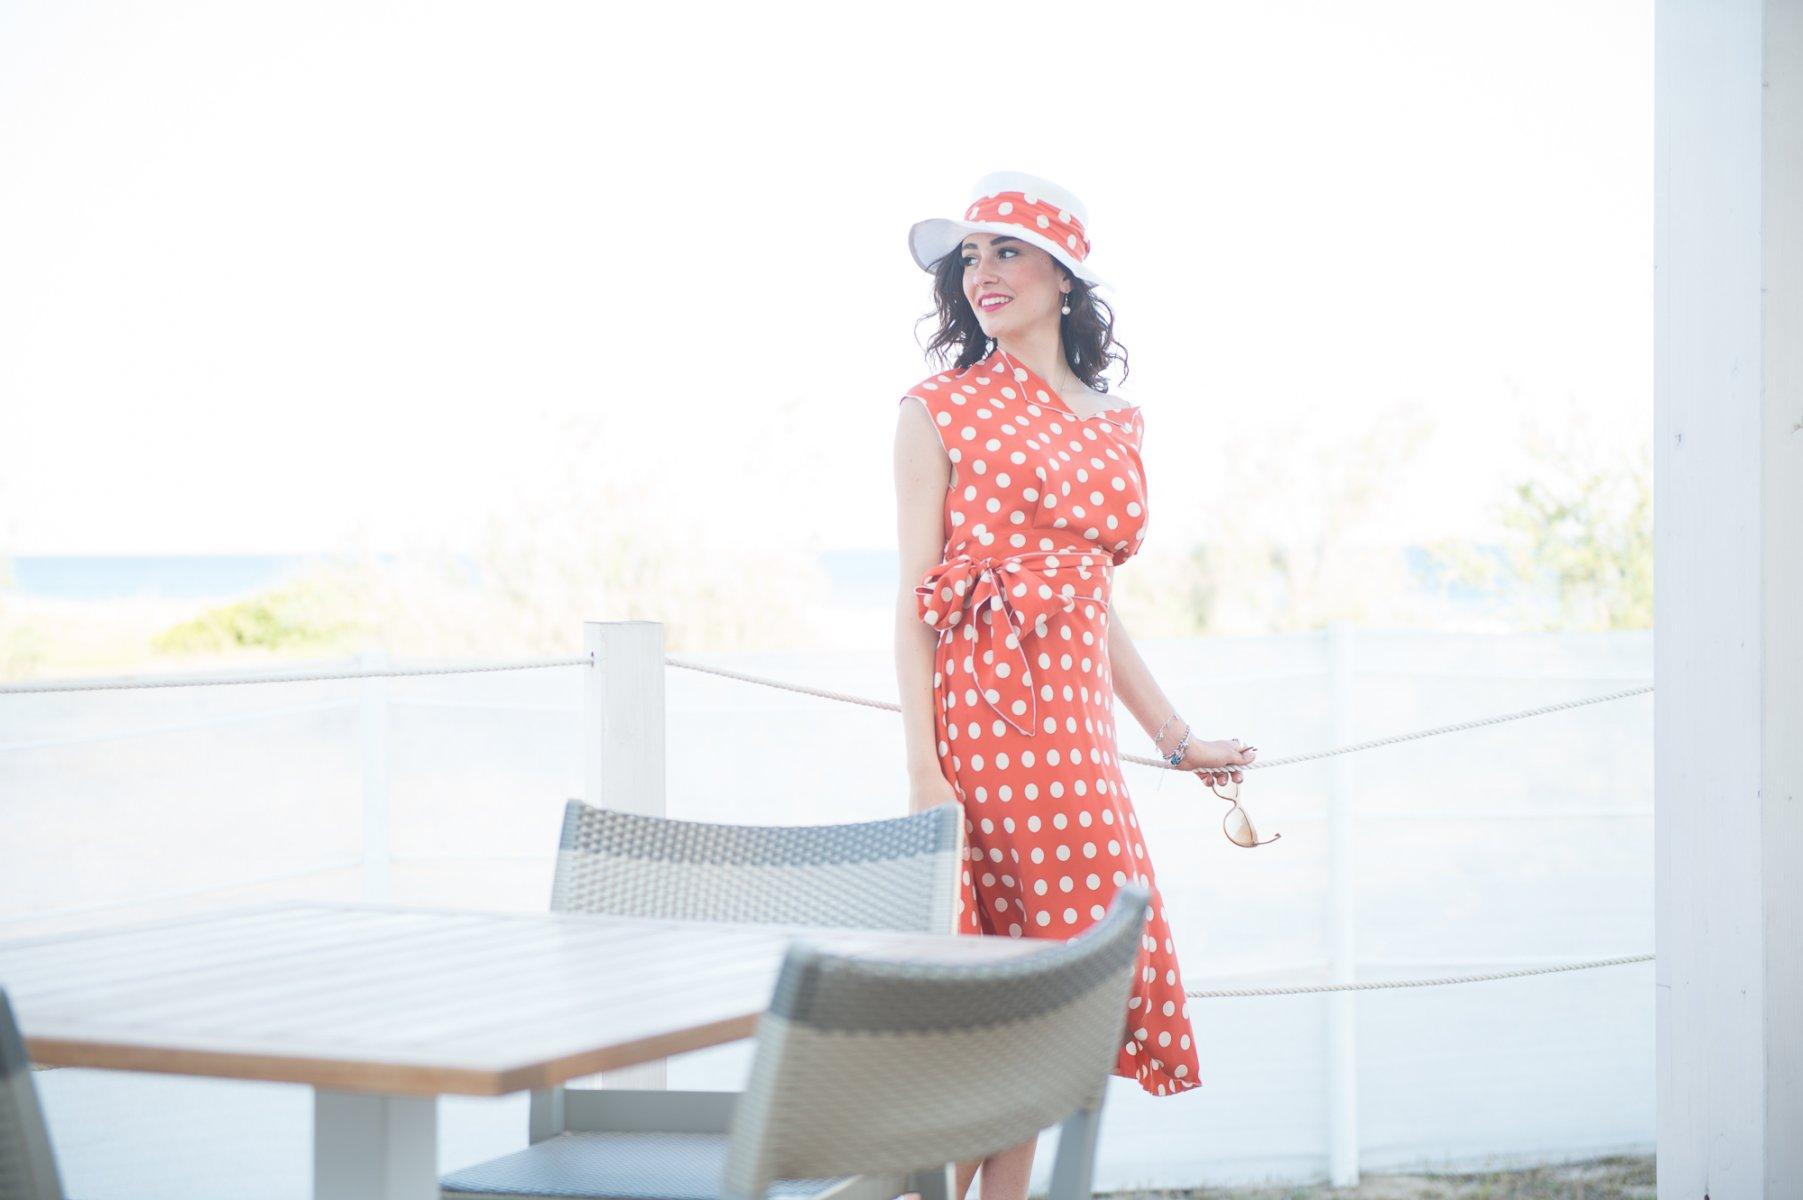 210a-Pretty_Woman_MMD9503 Fashion/Adv